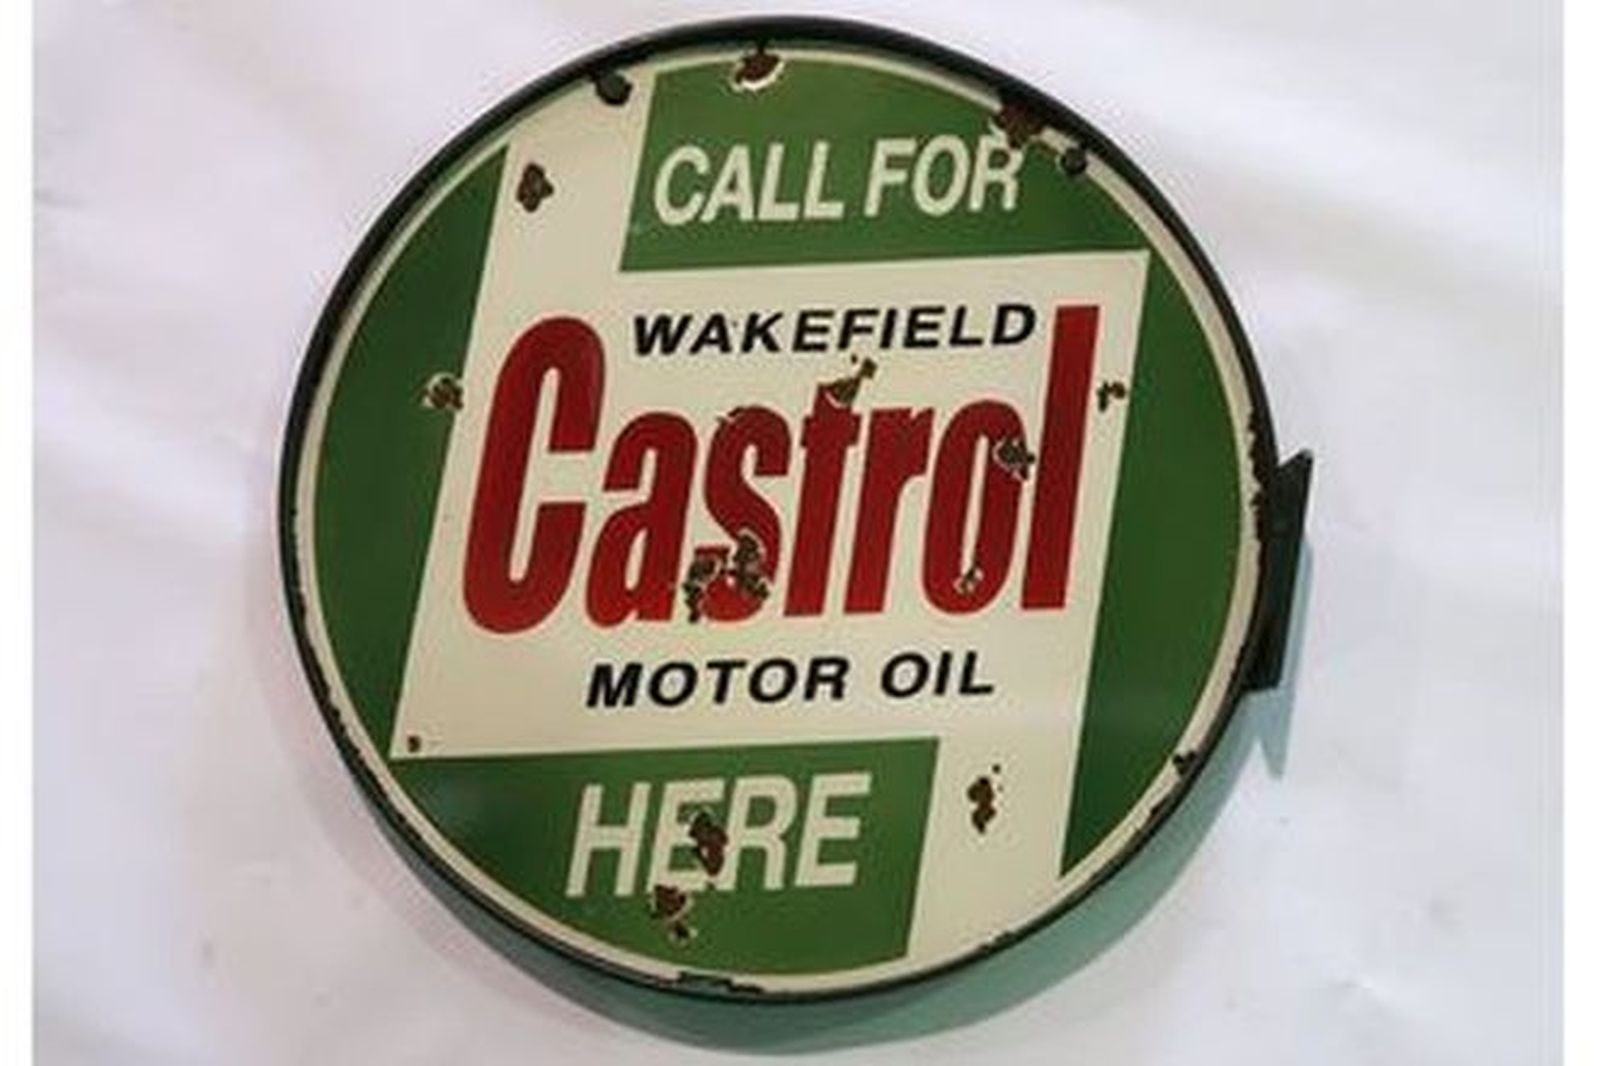 Enamel Sign - Round Wakefield Castrol Motor Oil on Mounting Bracket (61cm diameter)